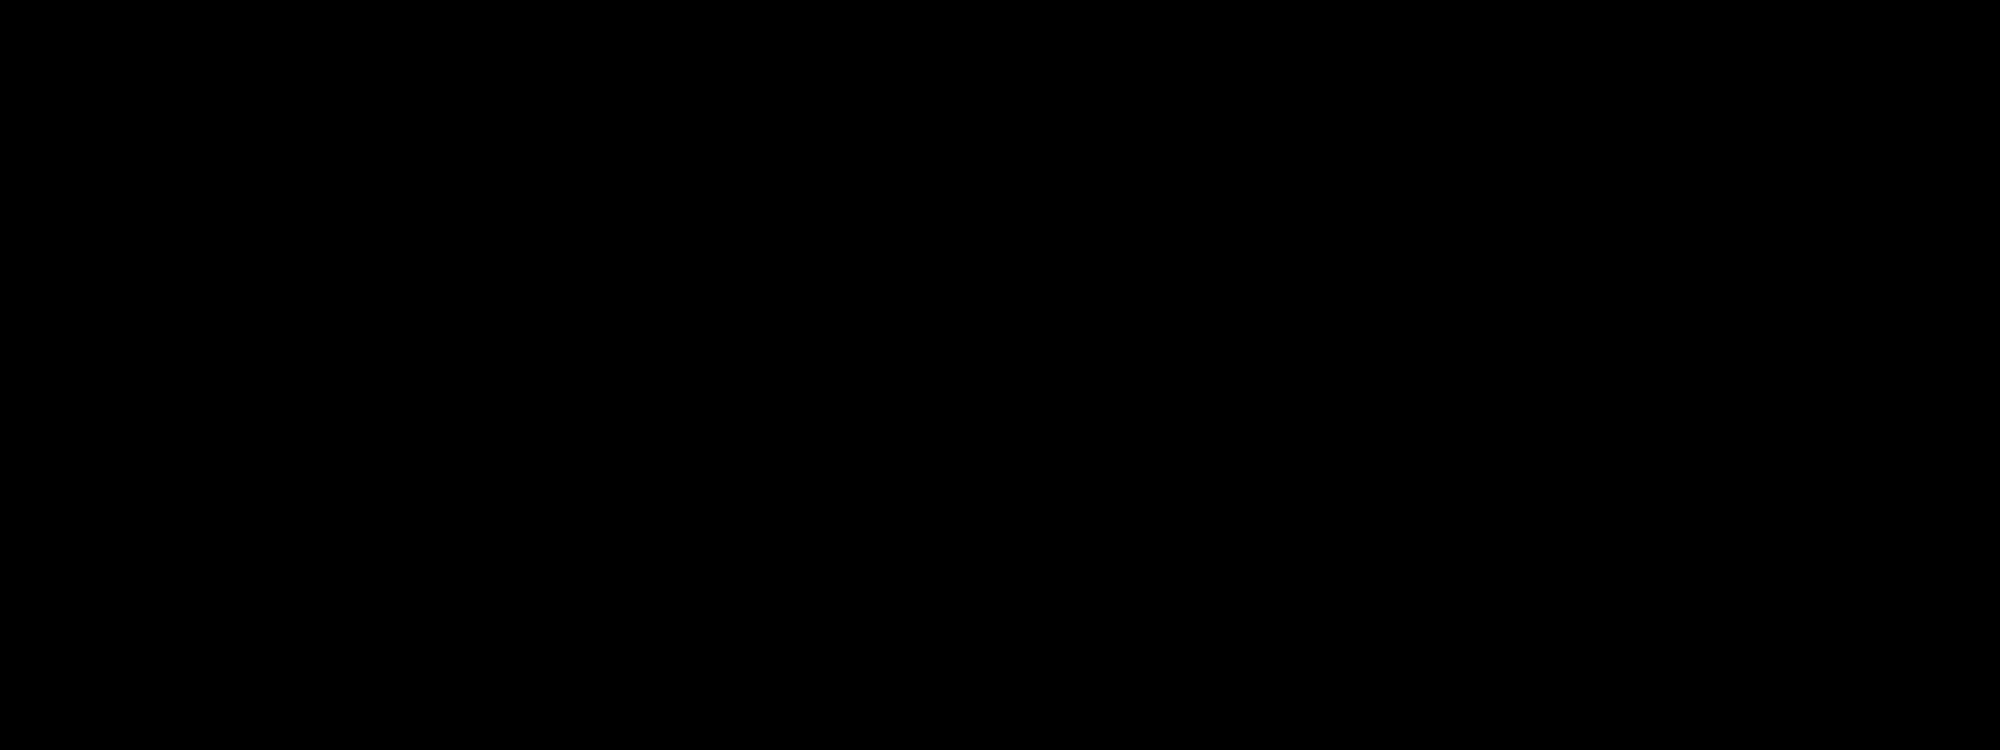 Resistor Simbol - ClipArt Best